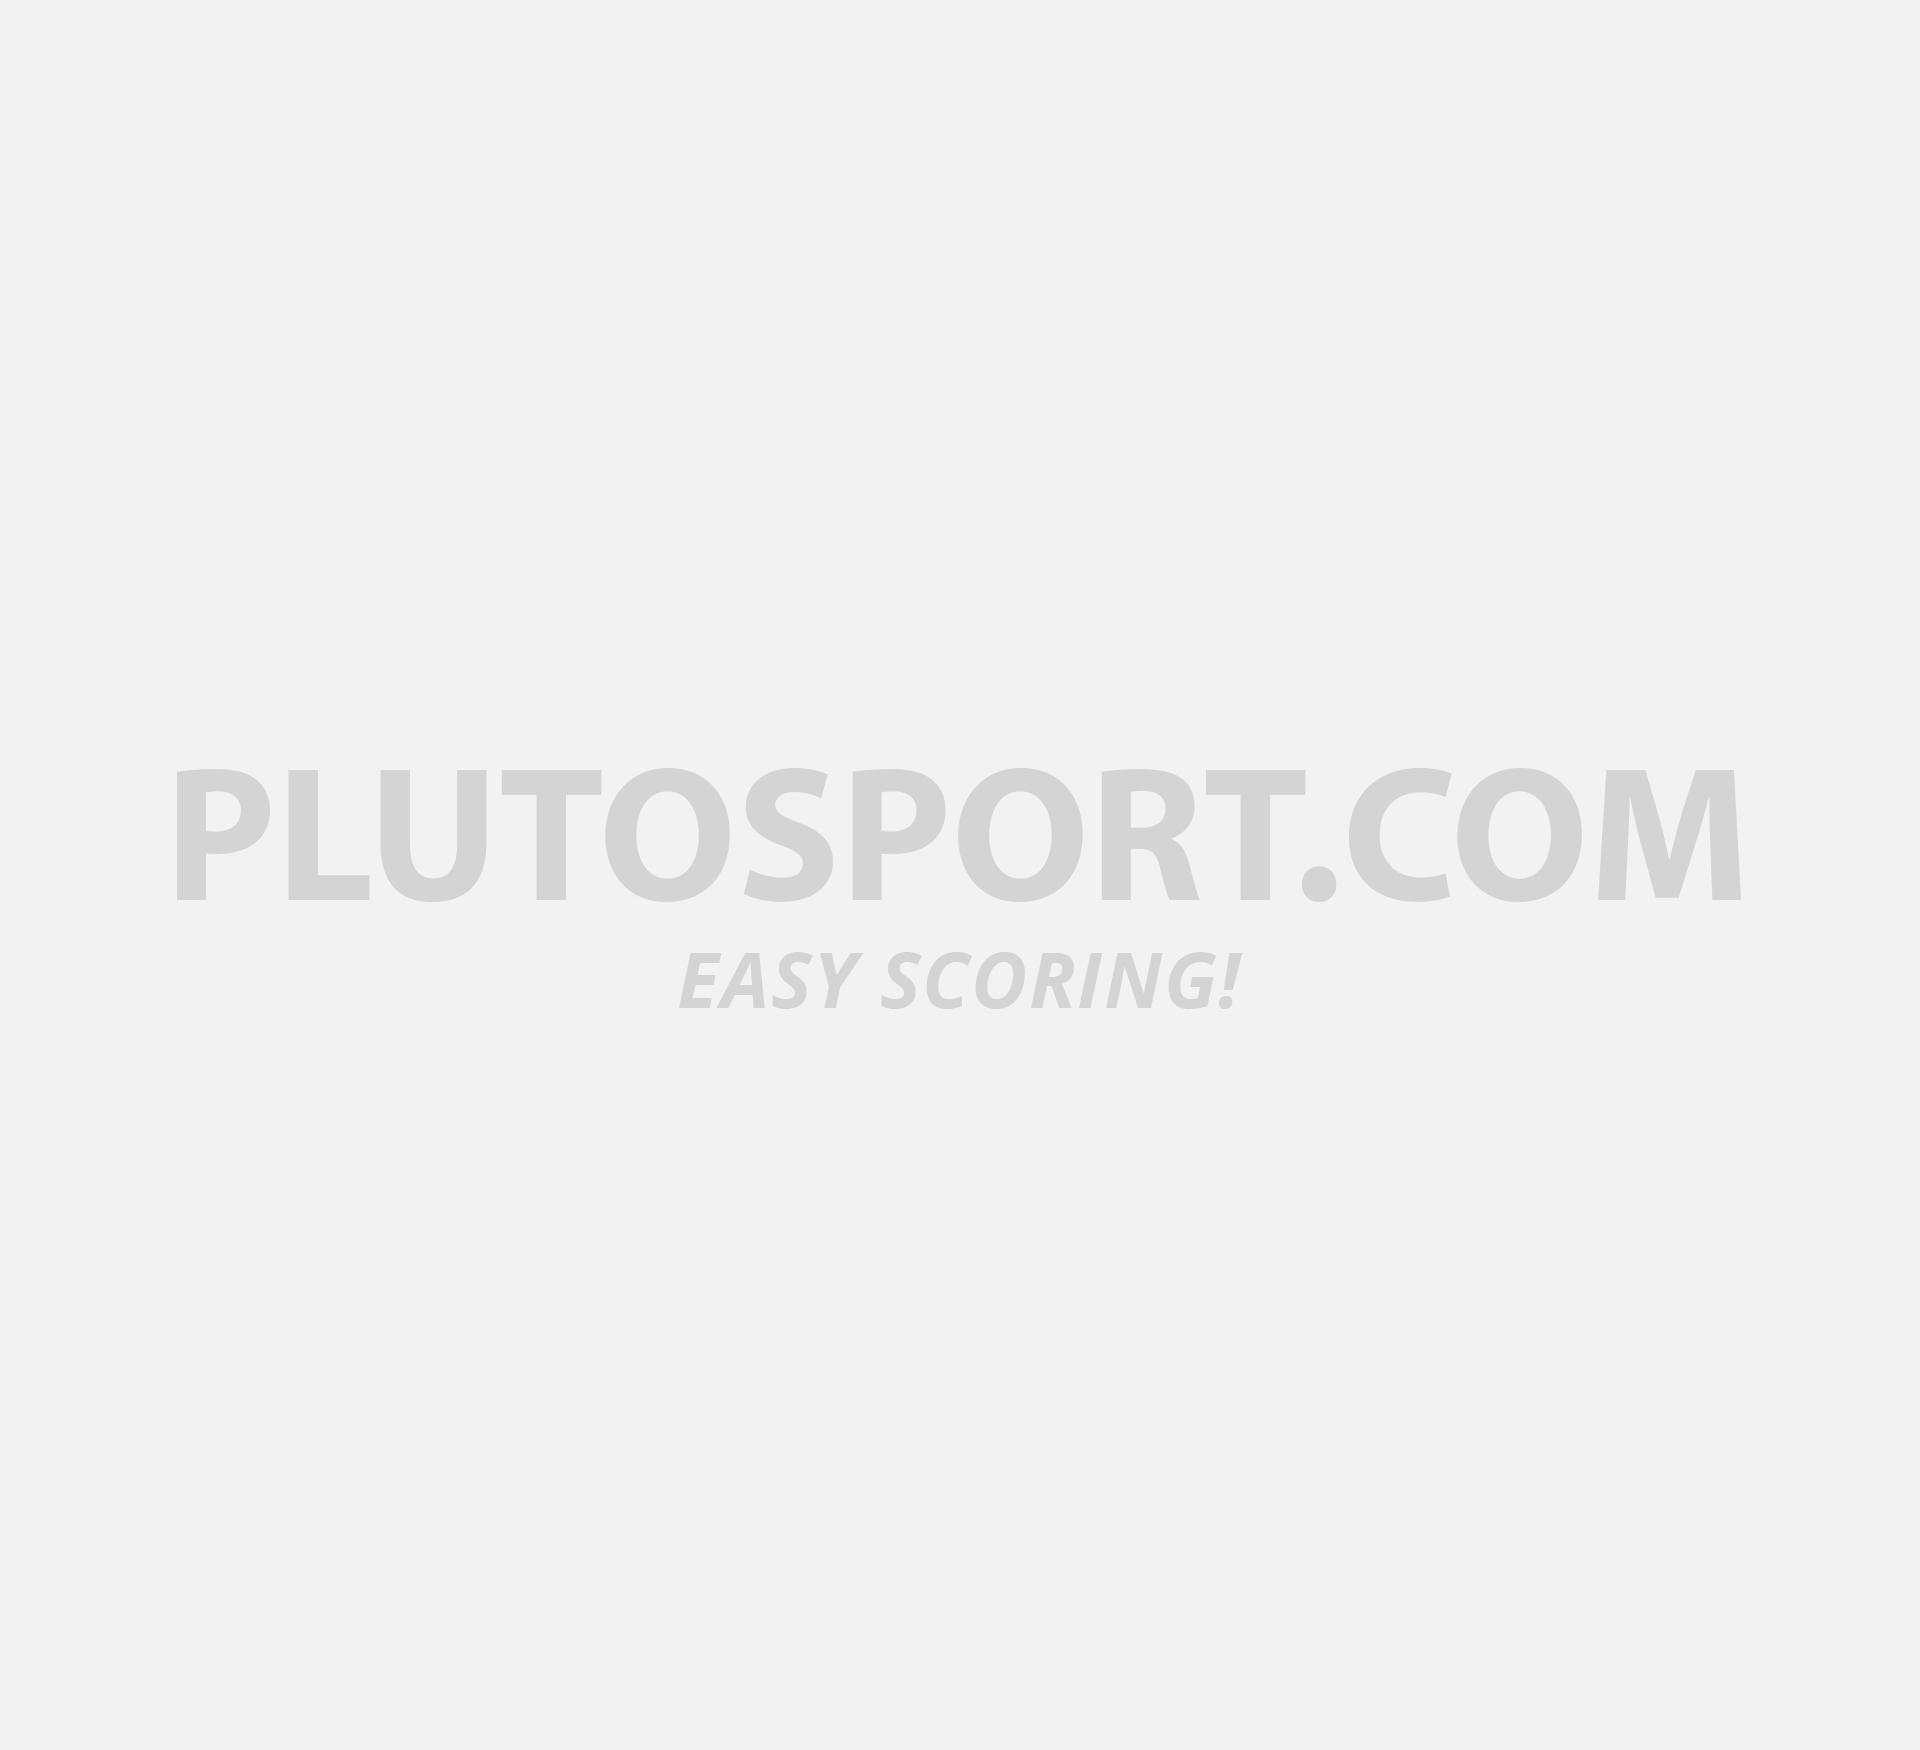 Asics Gel Crossover Gel Crossover 5 Turf Chaussures Hockey Femme 19905 | ca72c0f - www19216811.site